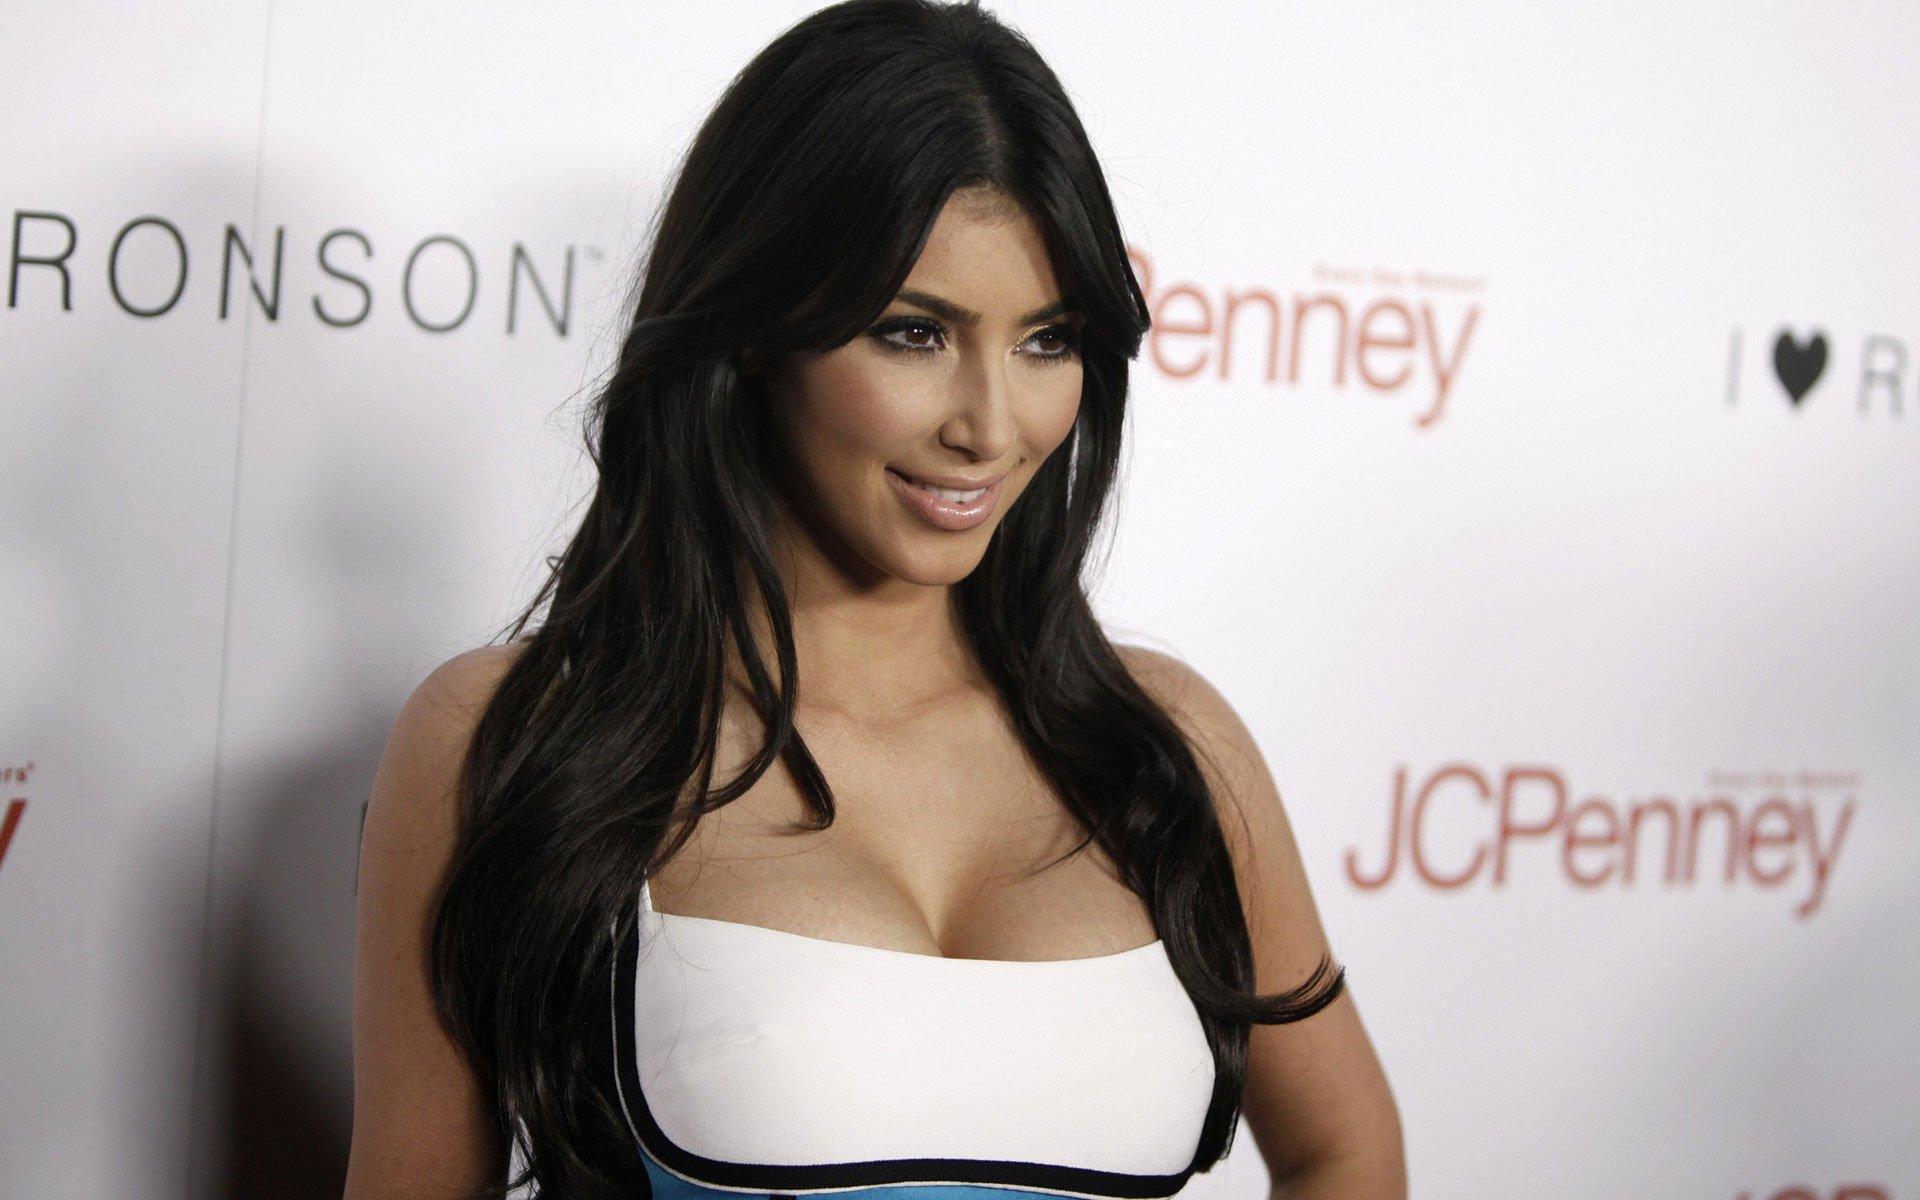 Kim-Kardashian-for-iPhone-%C3%97768-Kim-Kardashian-Picture-wallpaper-wp340274